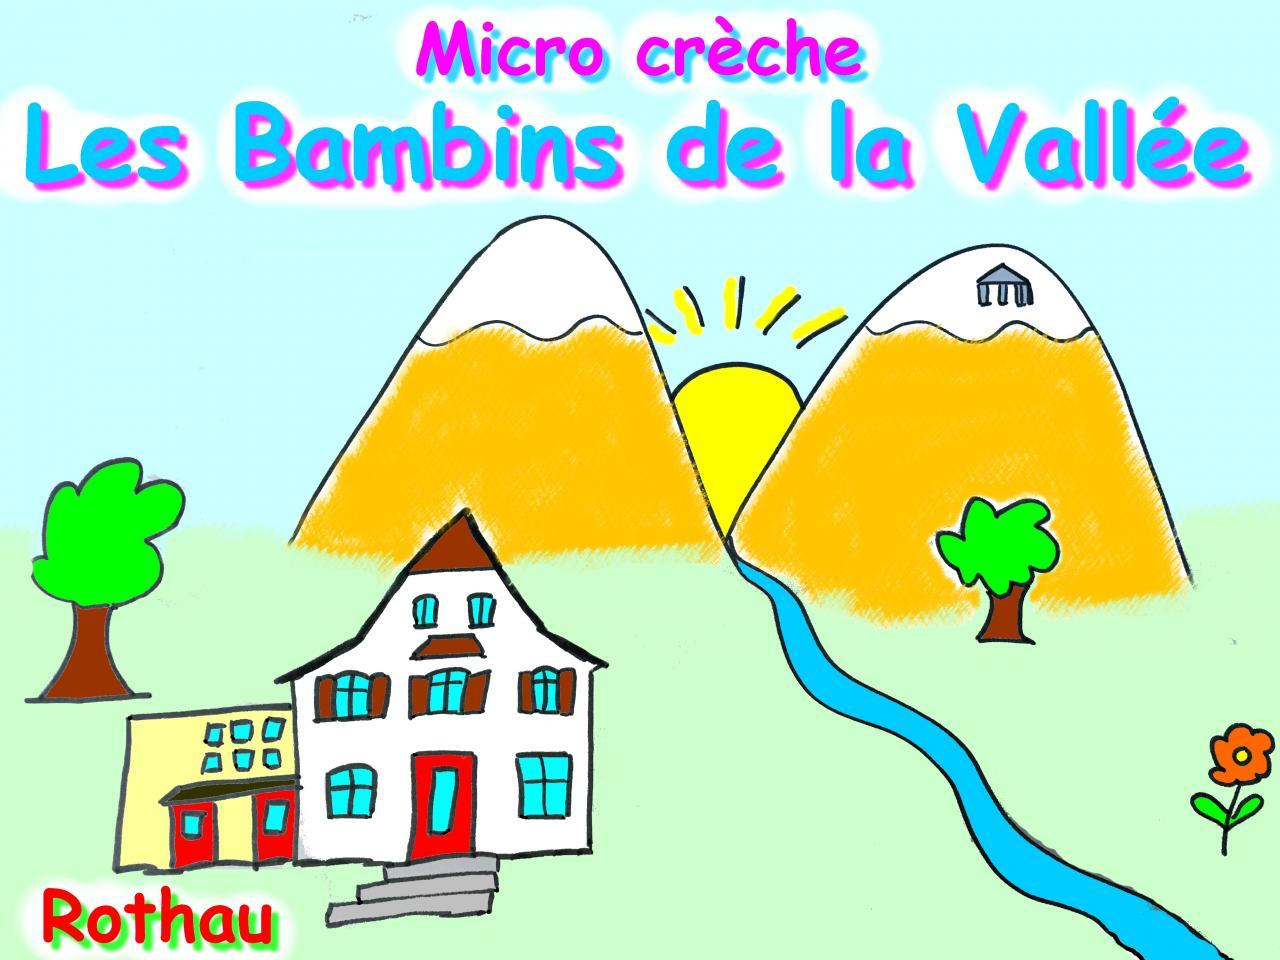 Micro crèche les bambins de la vallée Rothau